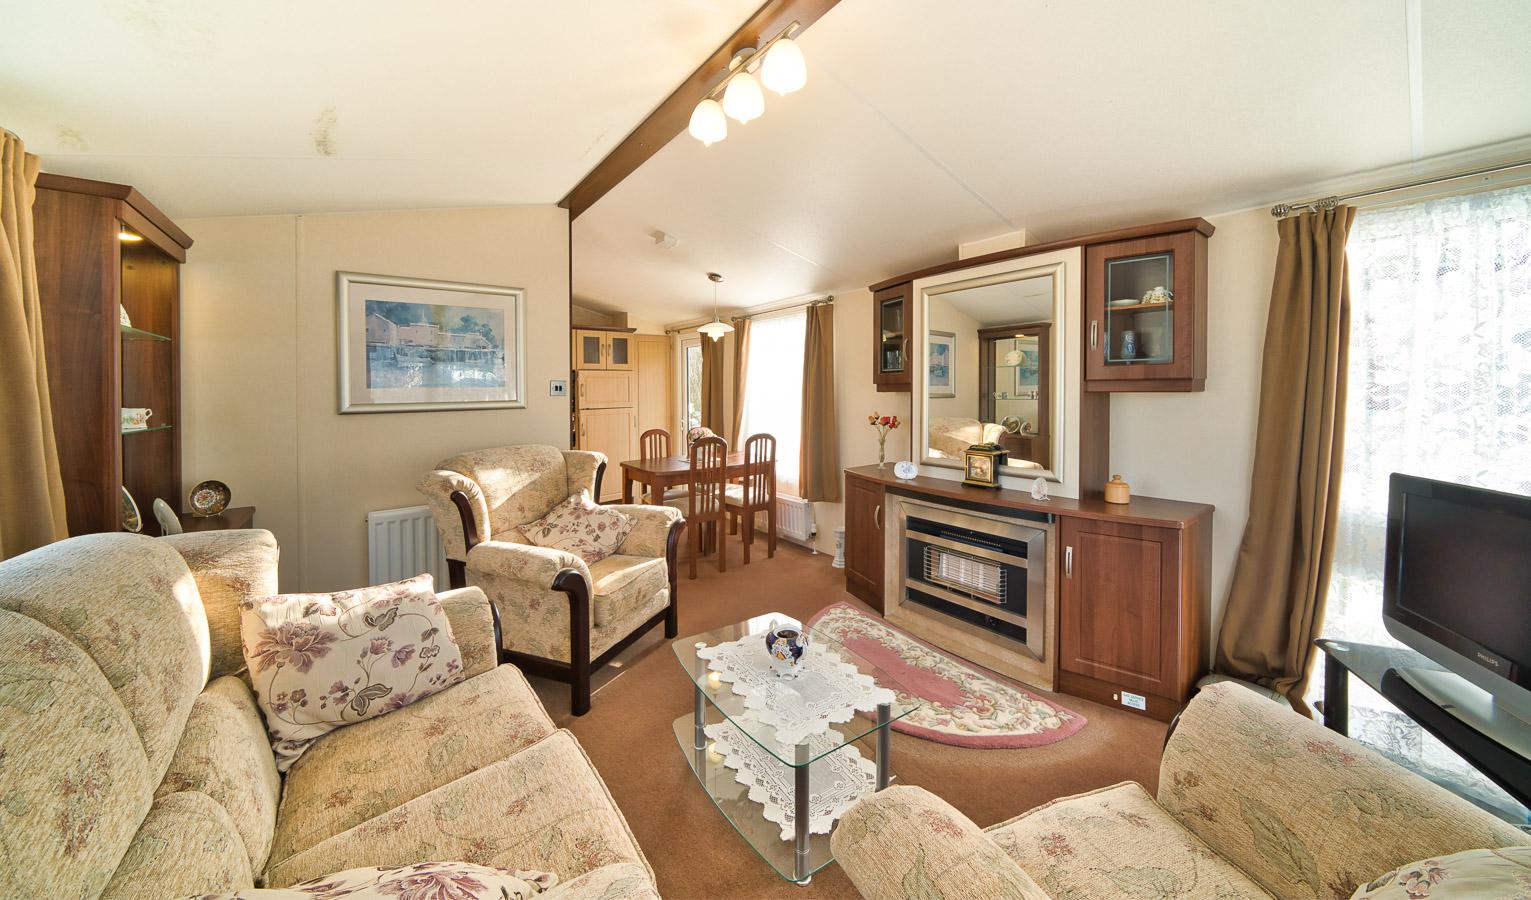 Best-Holiday-Static-Caravan-Sale-Charmouth-Lyme-Regis-Monkton-Wyld-9